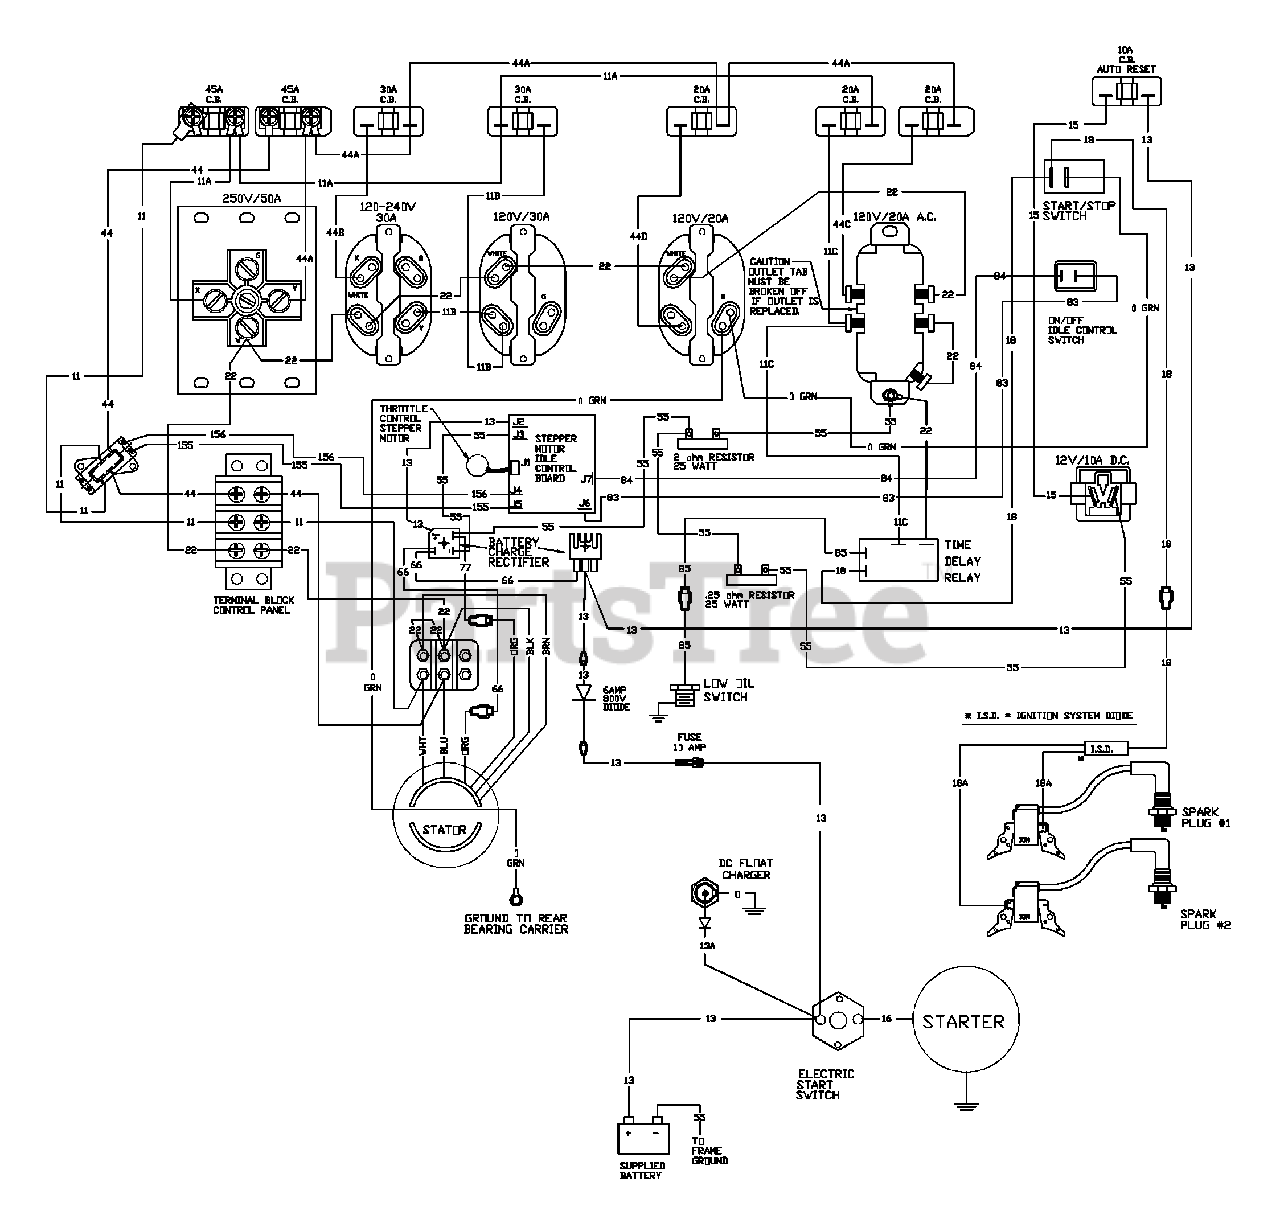 Generac 9801 8 Generac Exl 10 000 Watt Portable Generator Wiring Diagram Parts Lookup With Diagrams Partstree